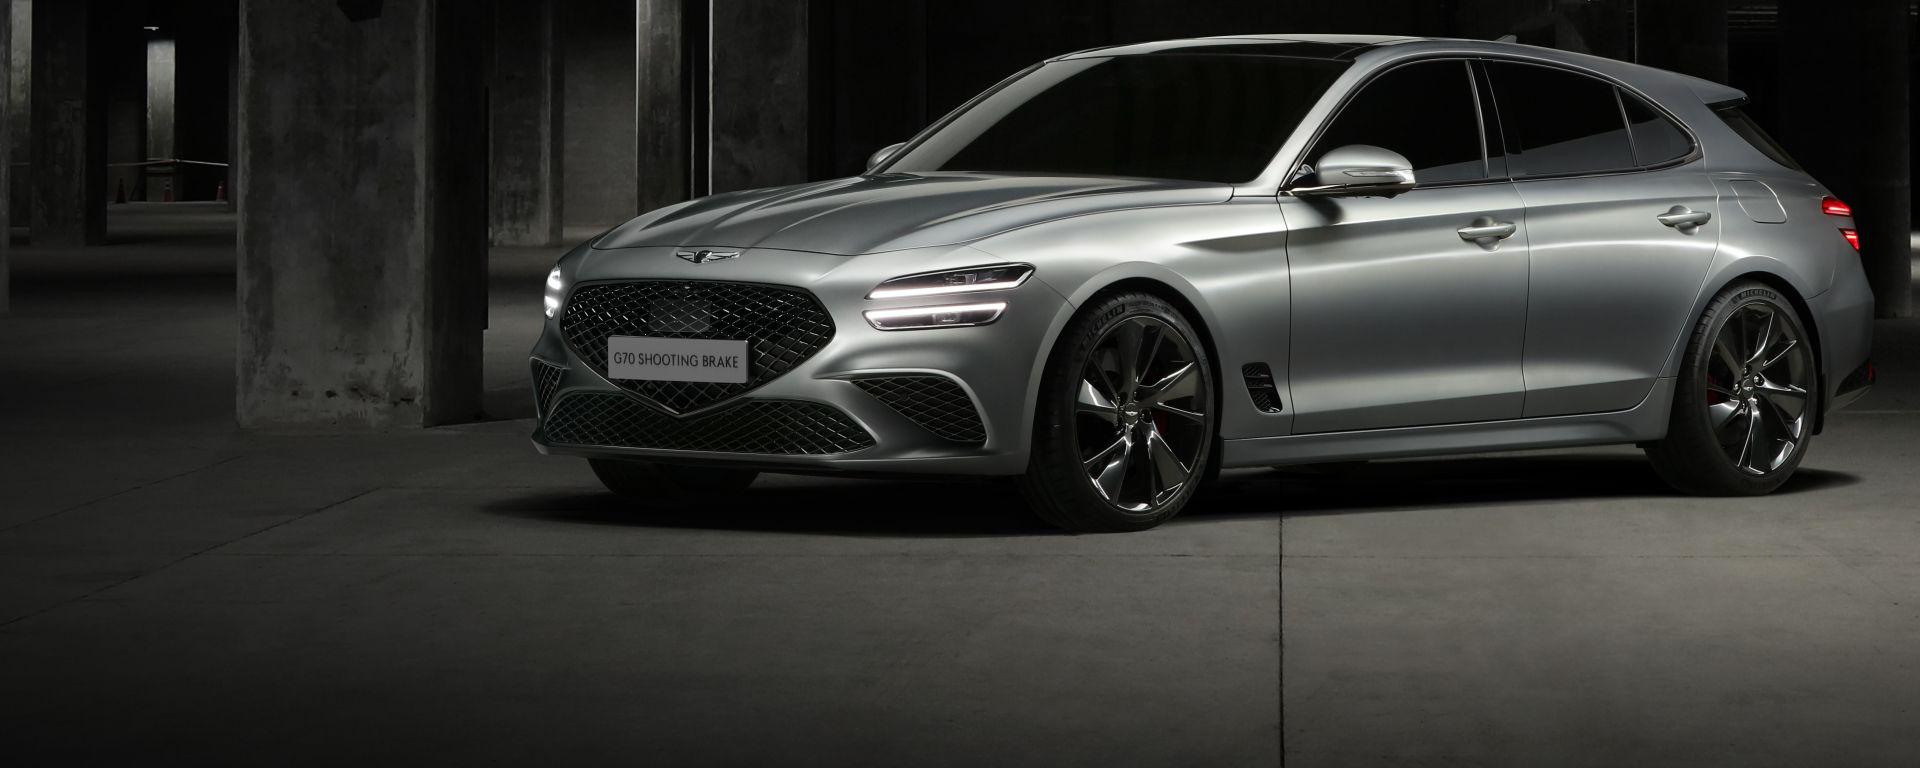 Genesis G70 Shooting Brake, sfida a BMW e Mercedes